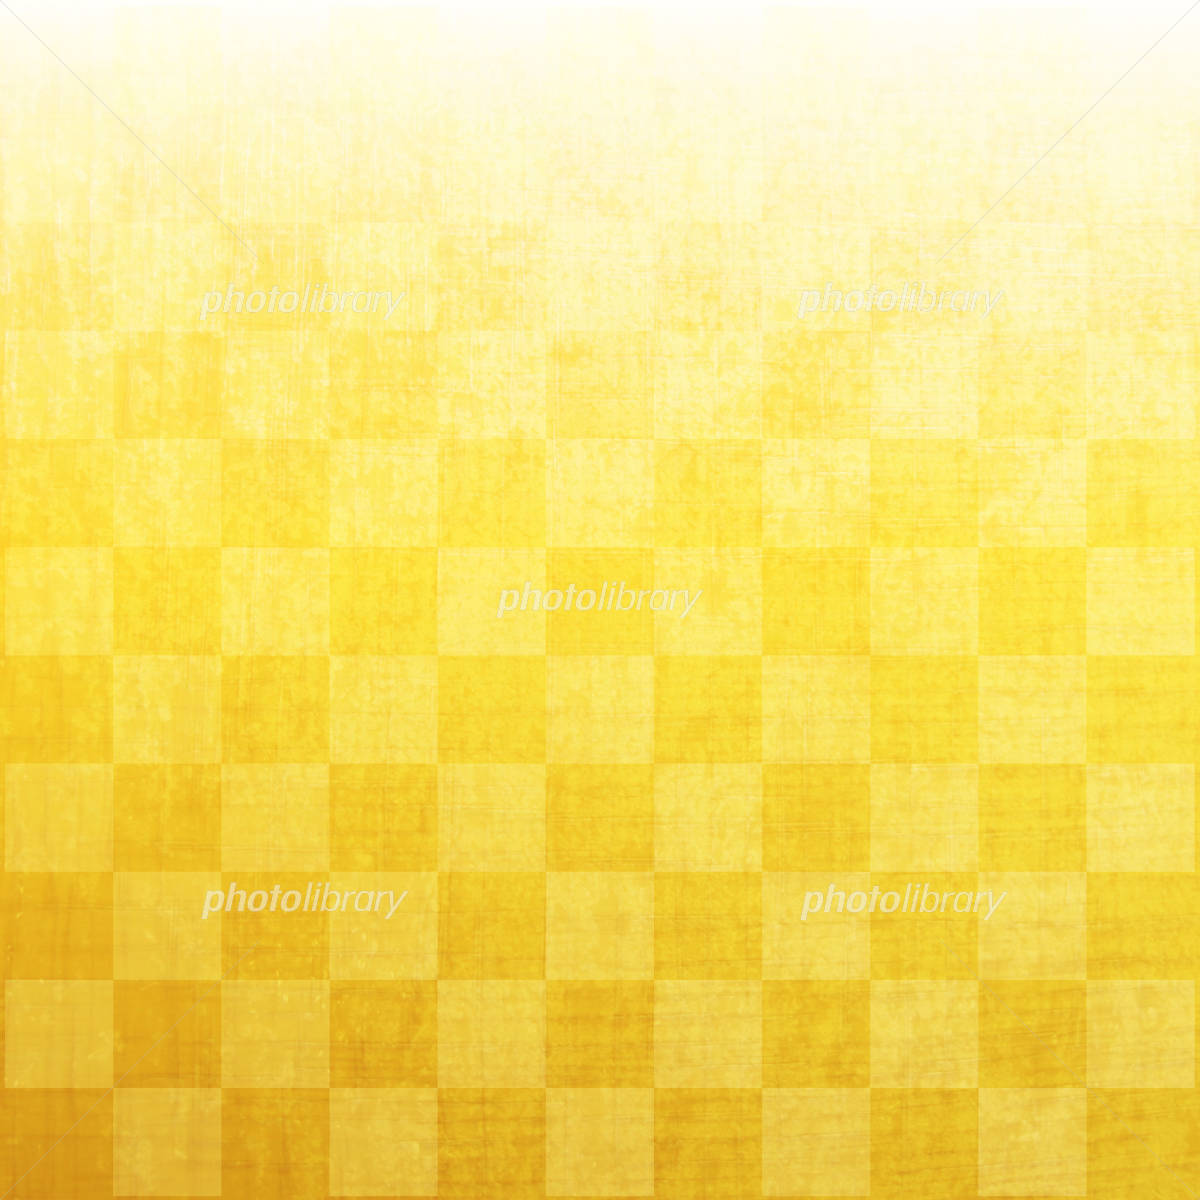 Checkered background イラスト素材